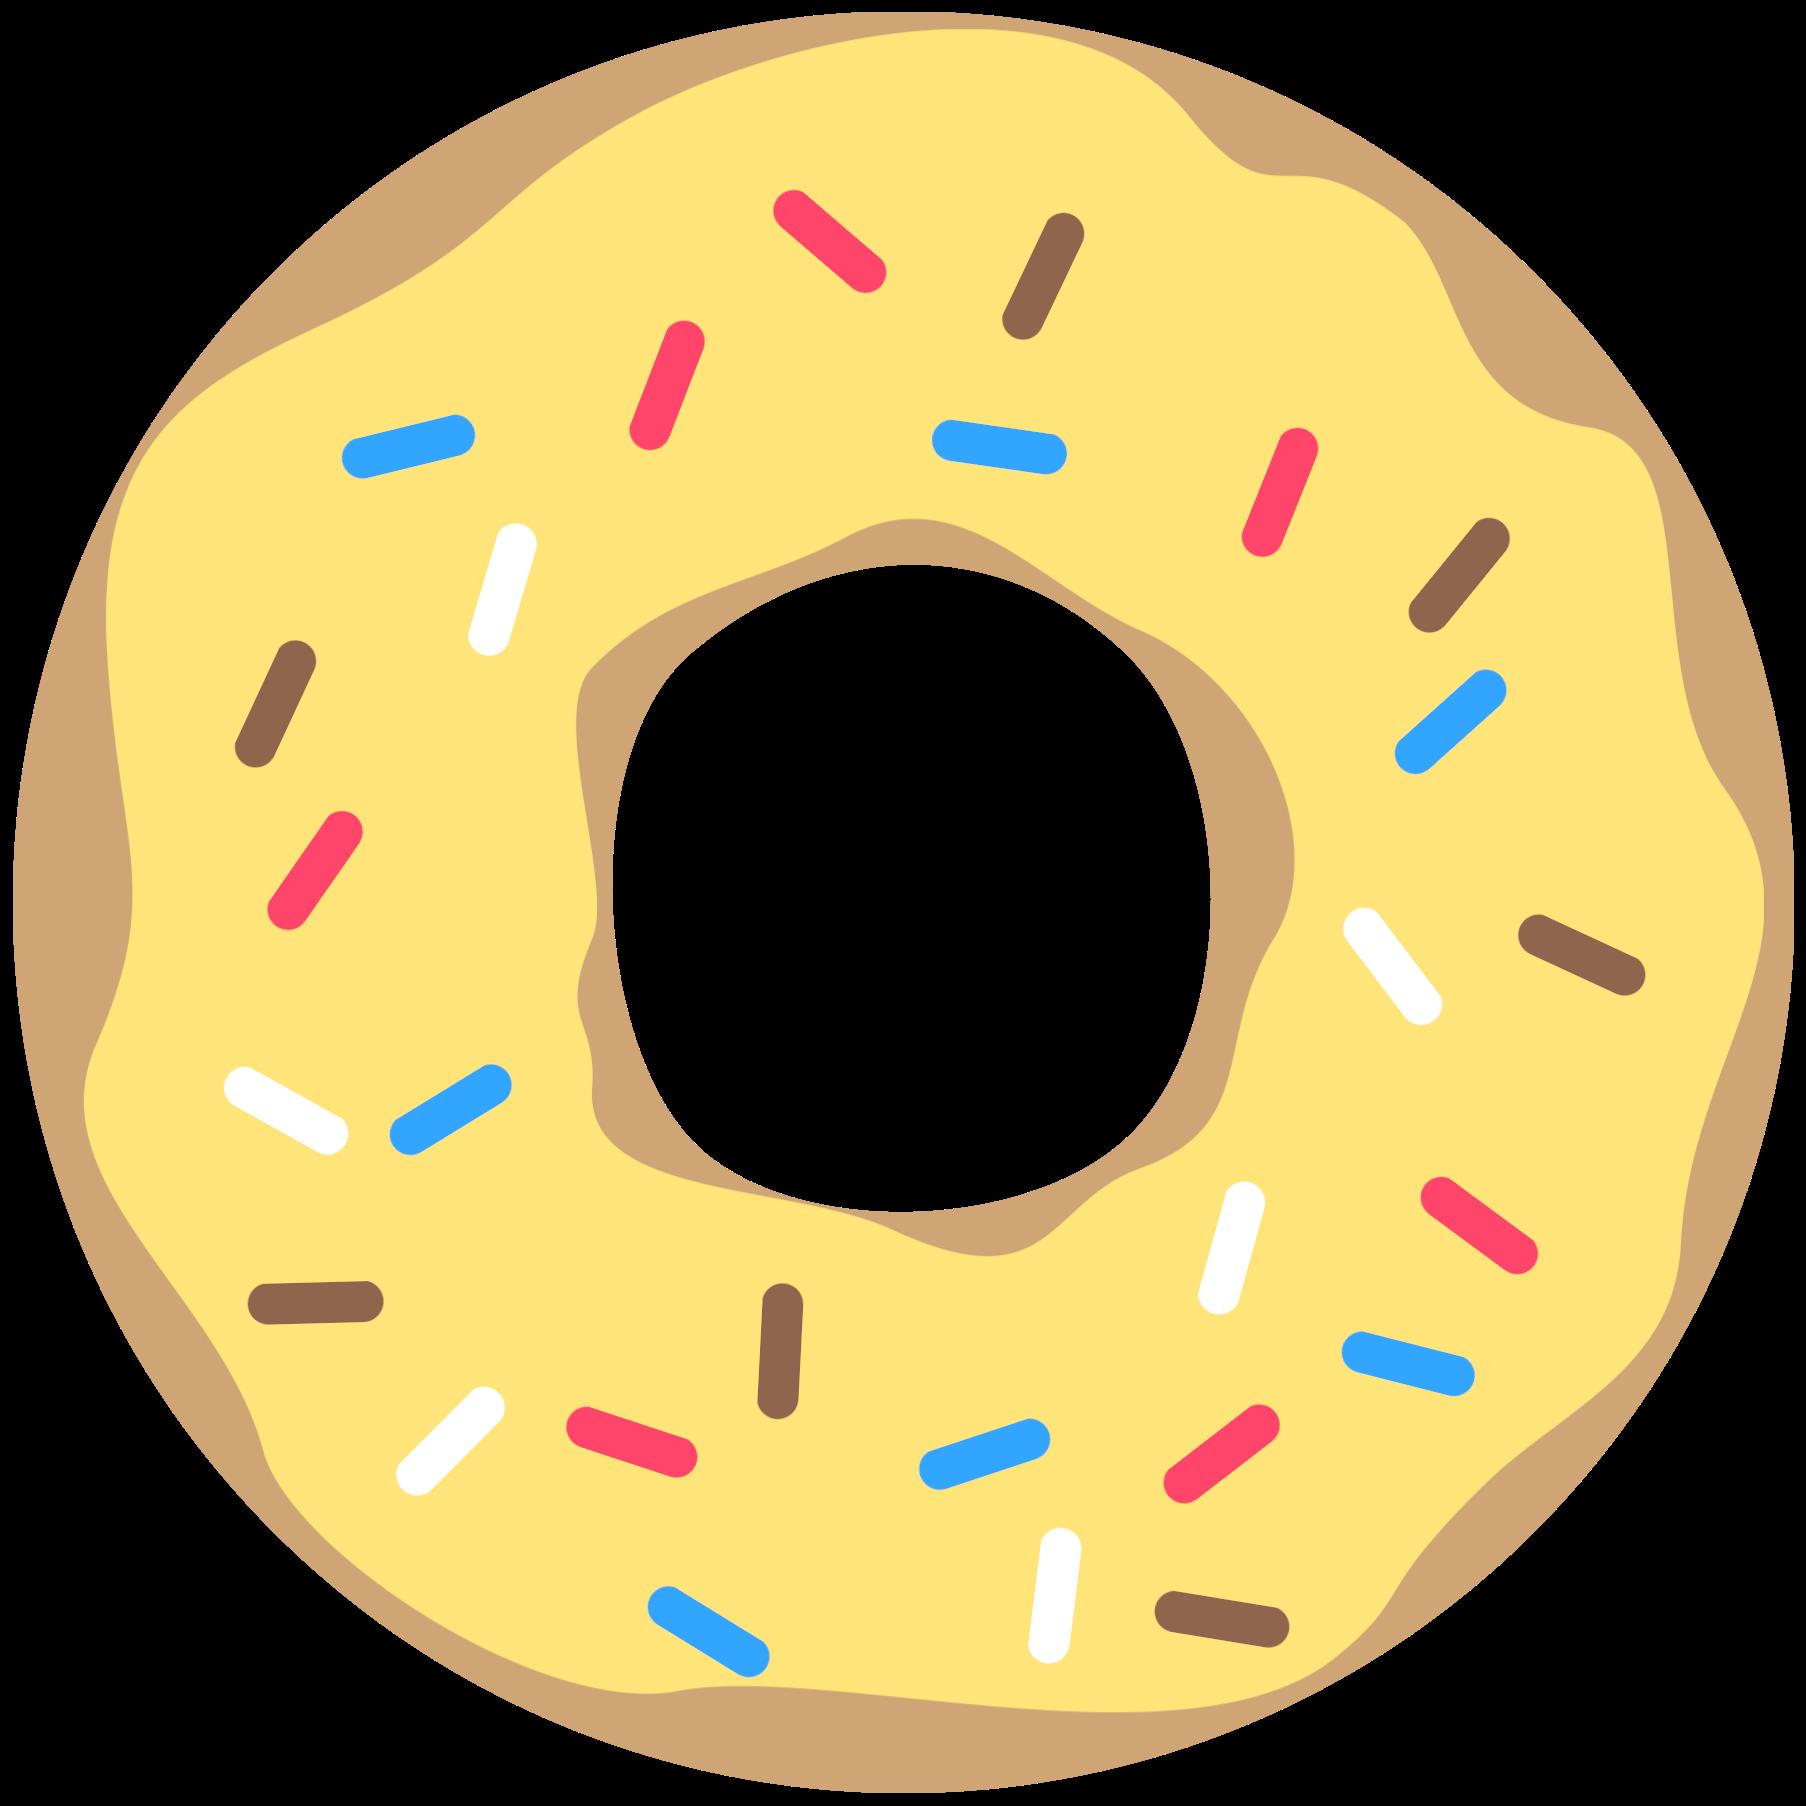 Download Krispy Kreme Doughnuts Clipart 5 By Sheila - Krispy Kreme Donuts  Png PNG Image with No Background - PNGkey.com